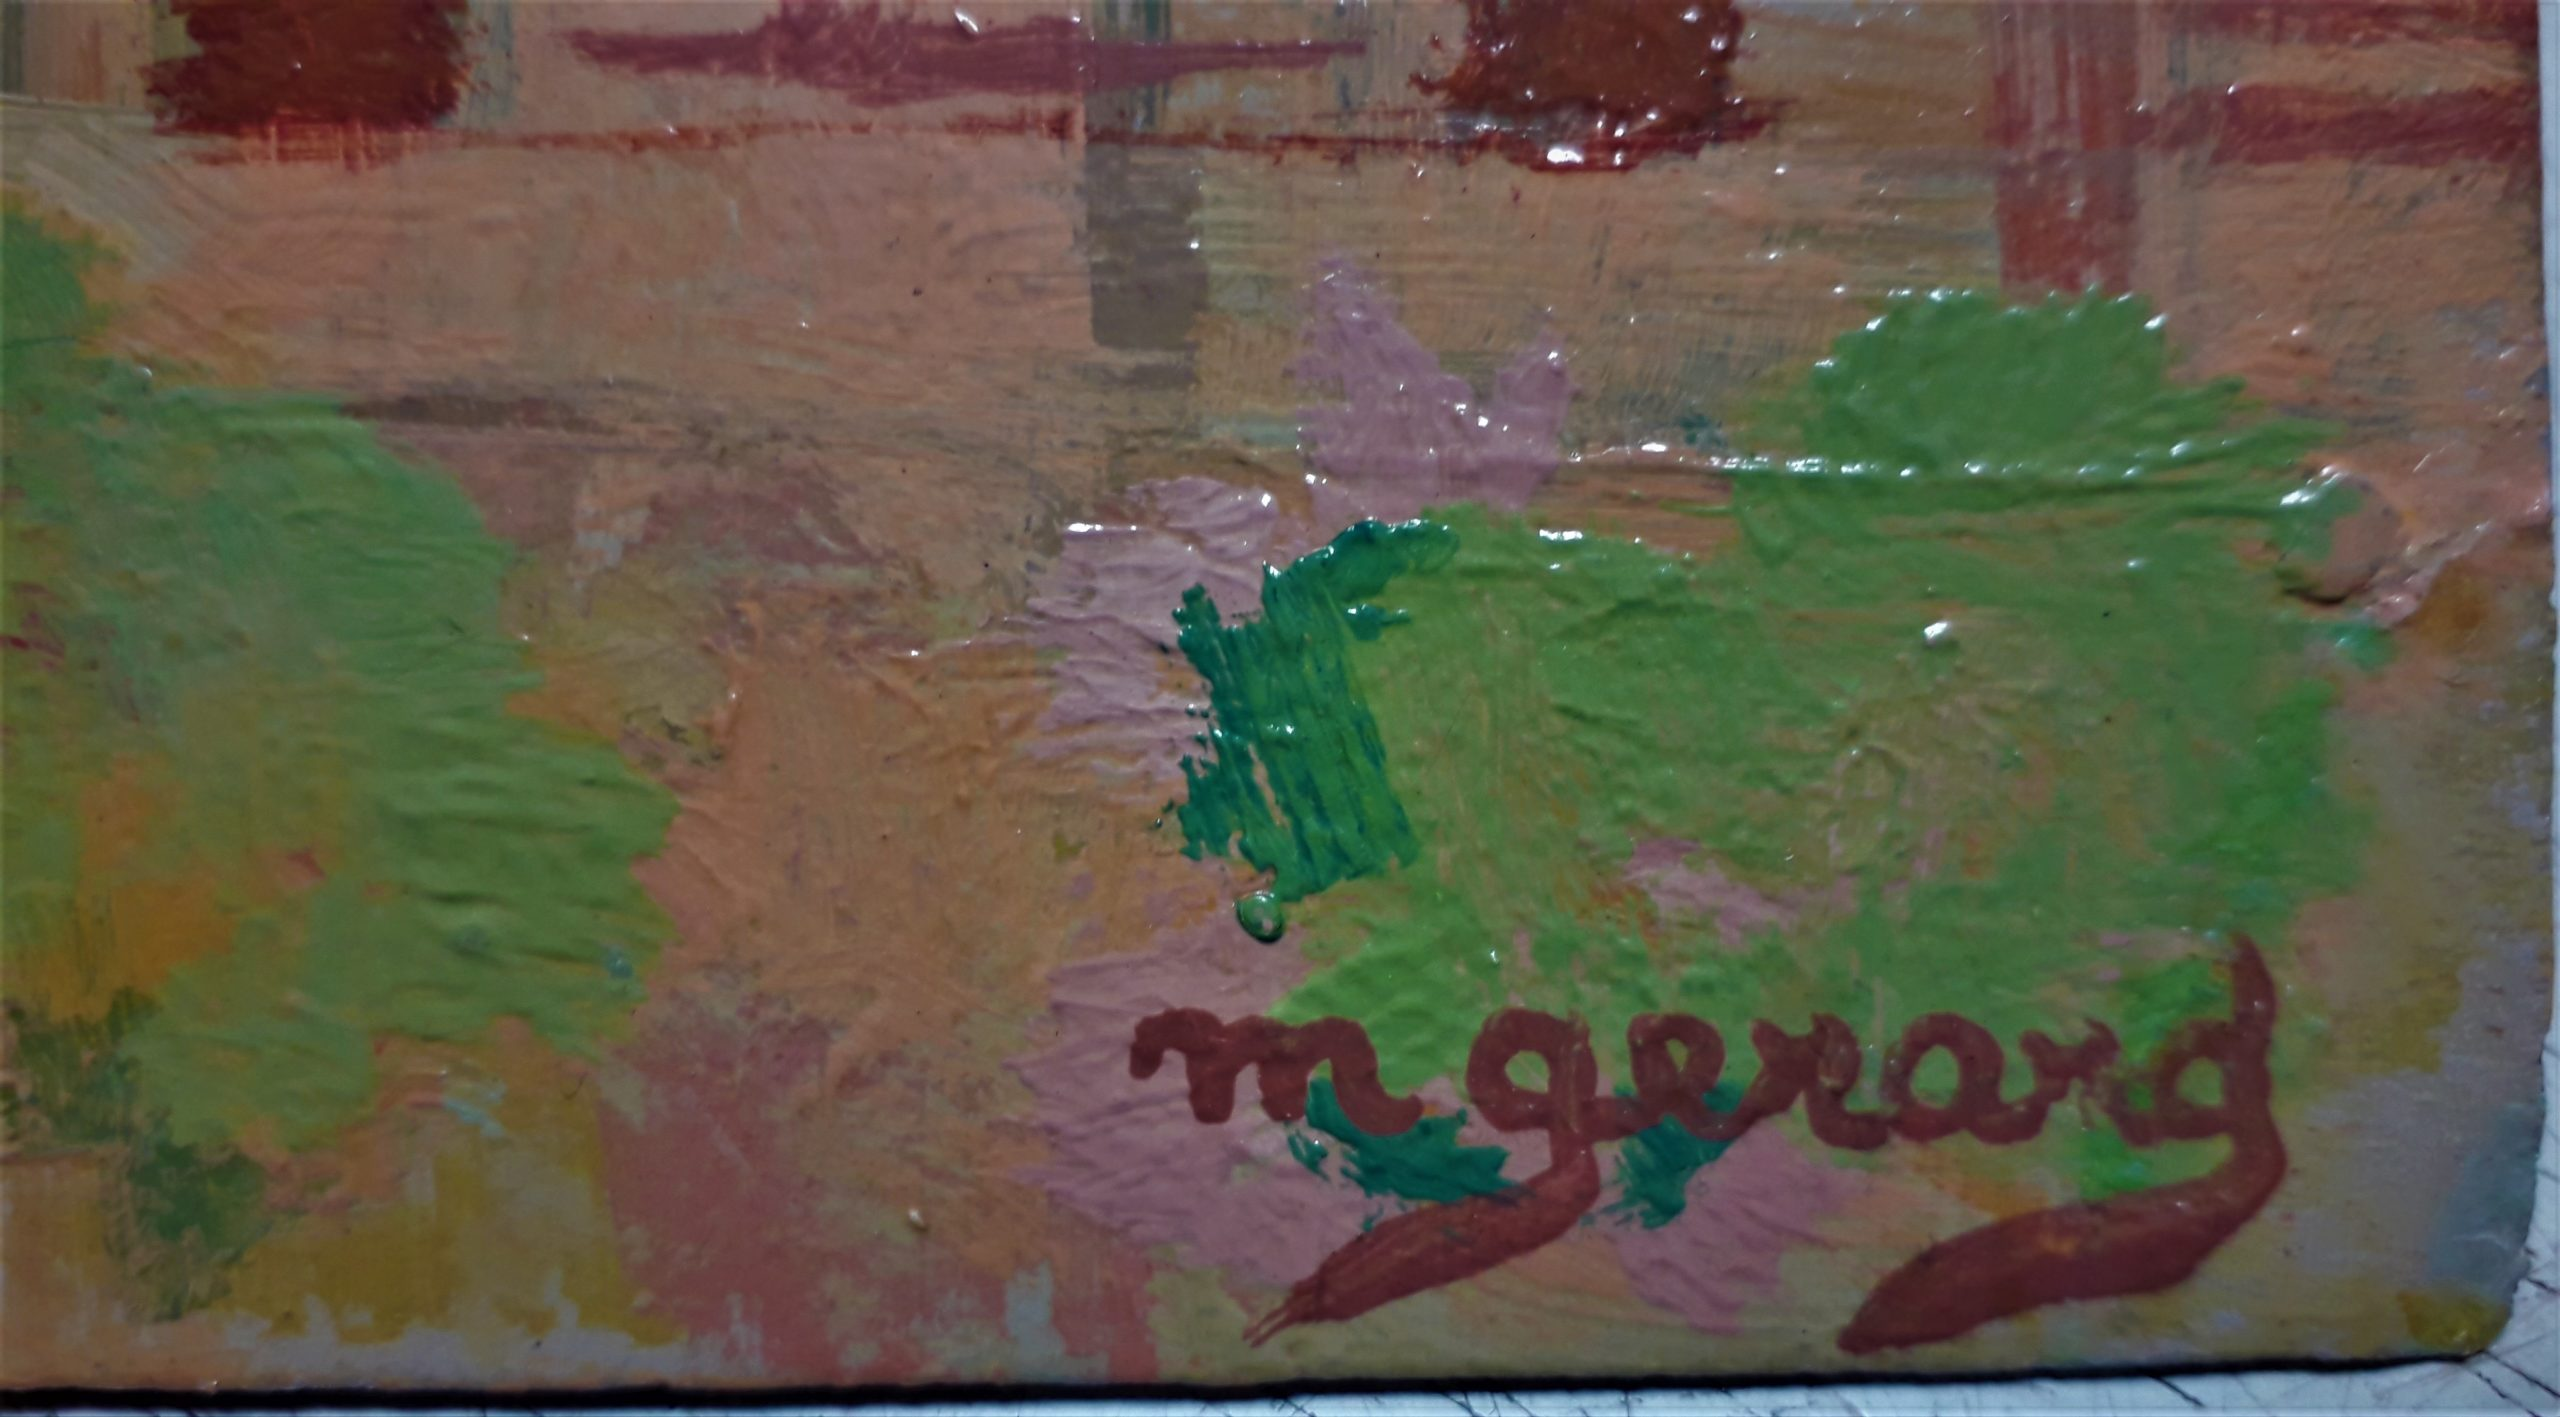 gerard-maud-seville-la-fabrique-de-cigarettes-1961-signature